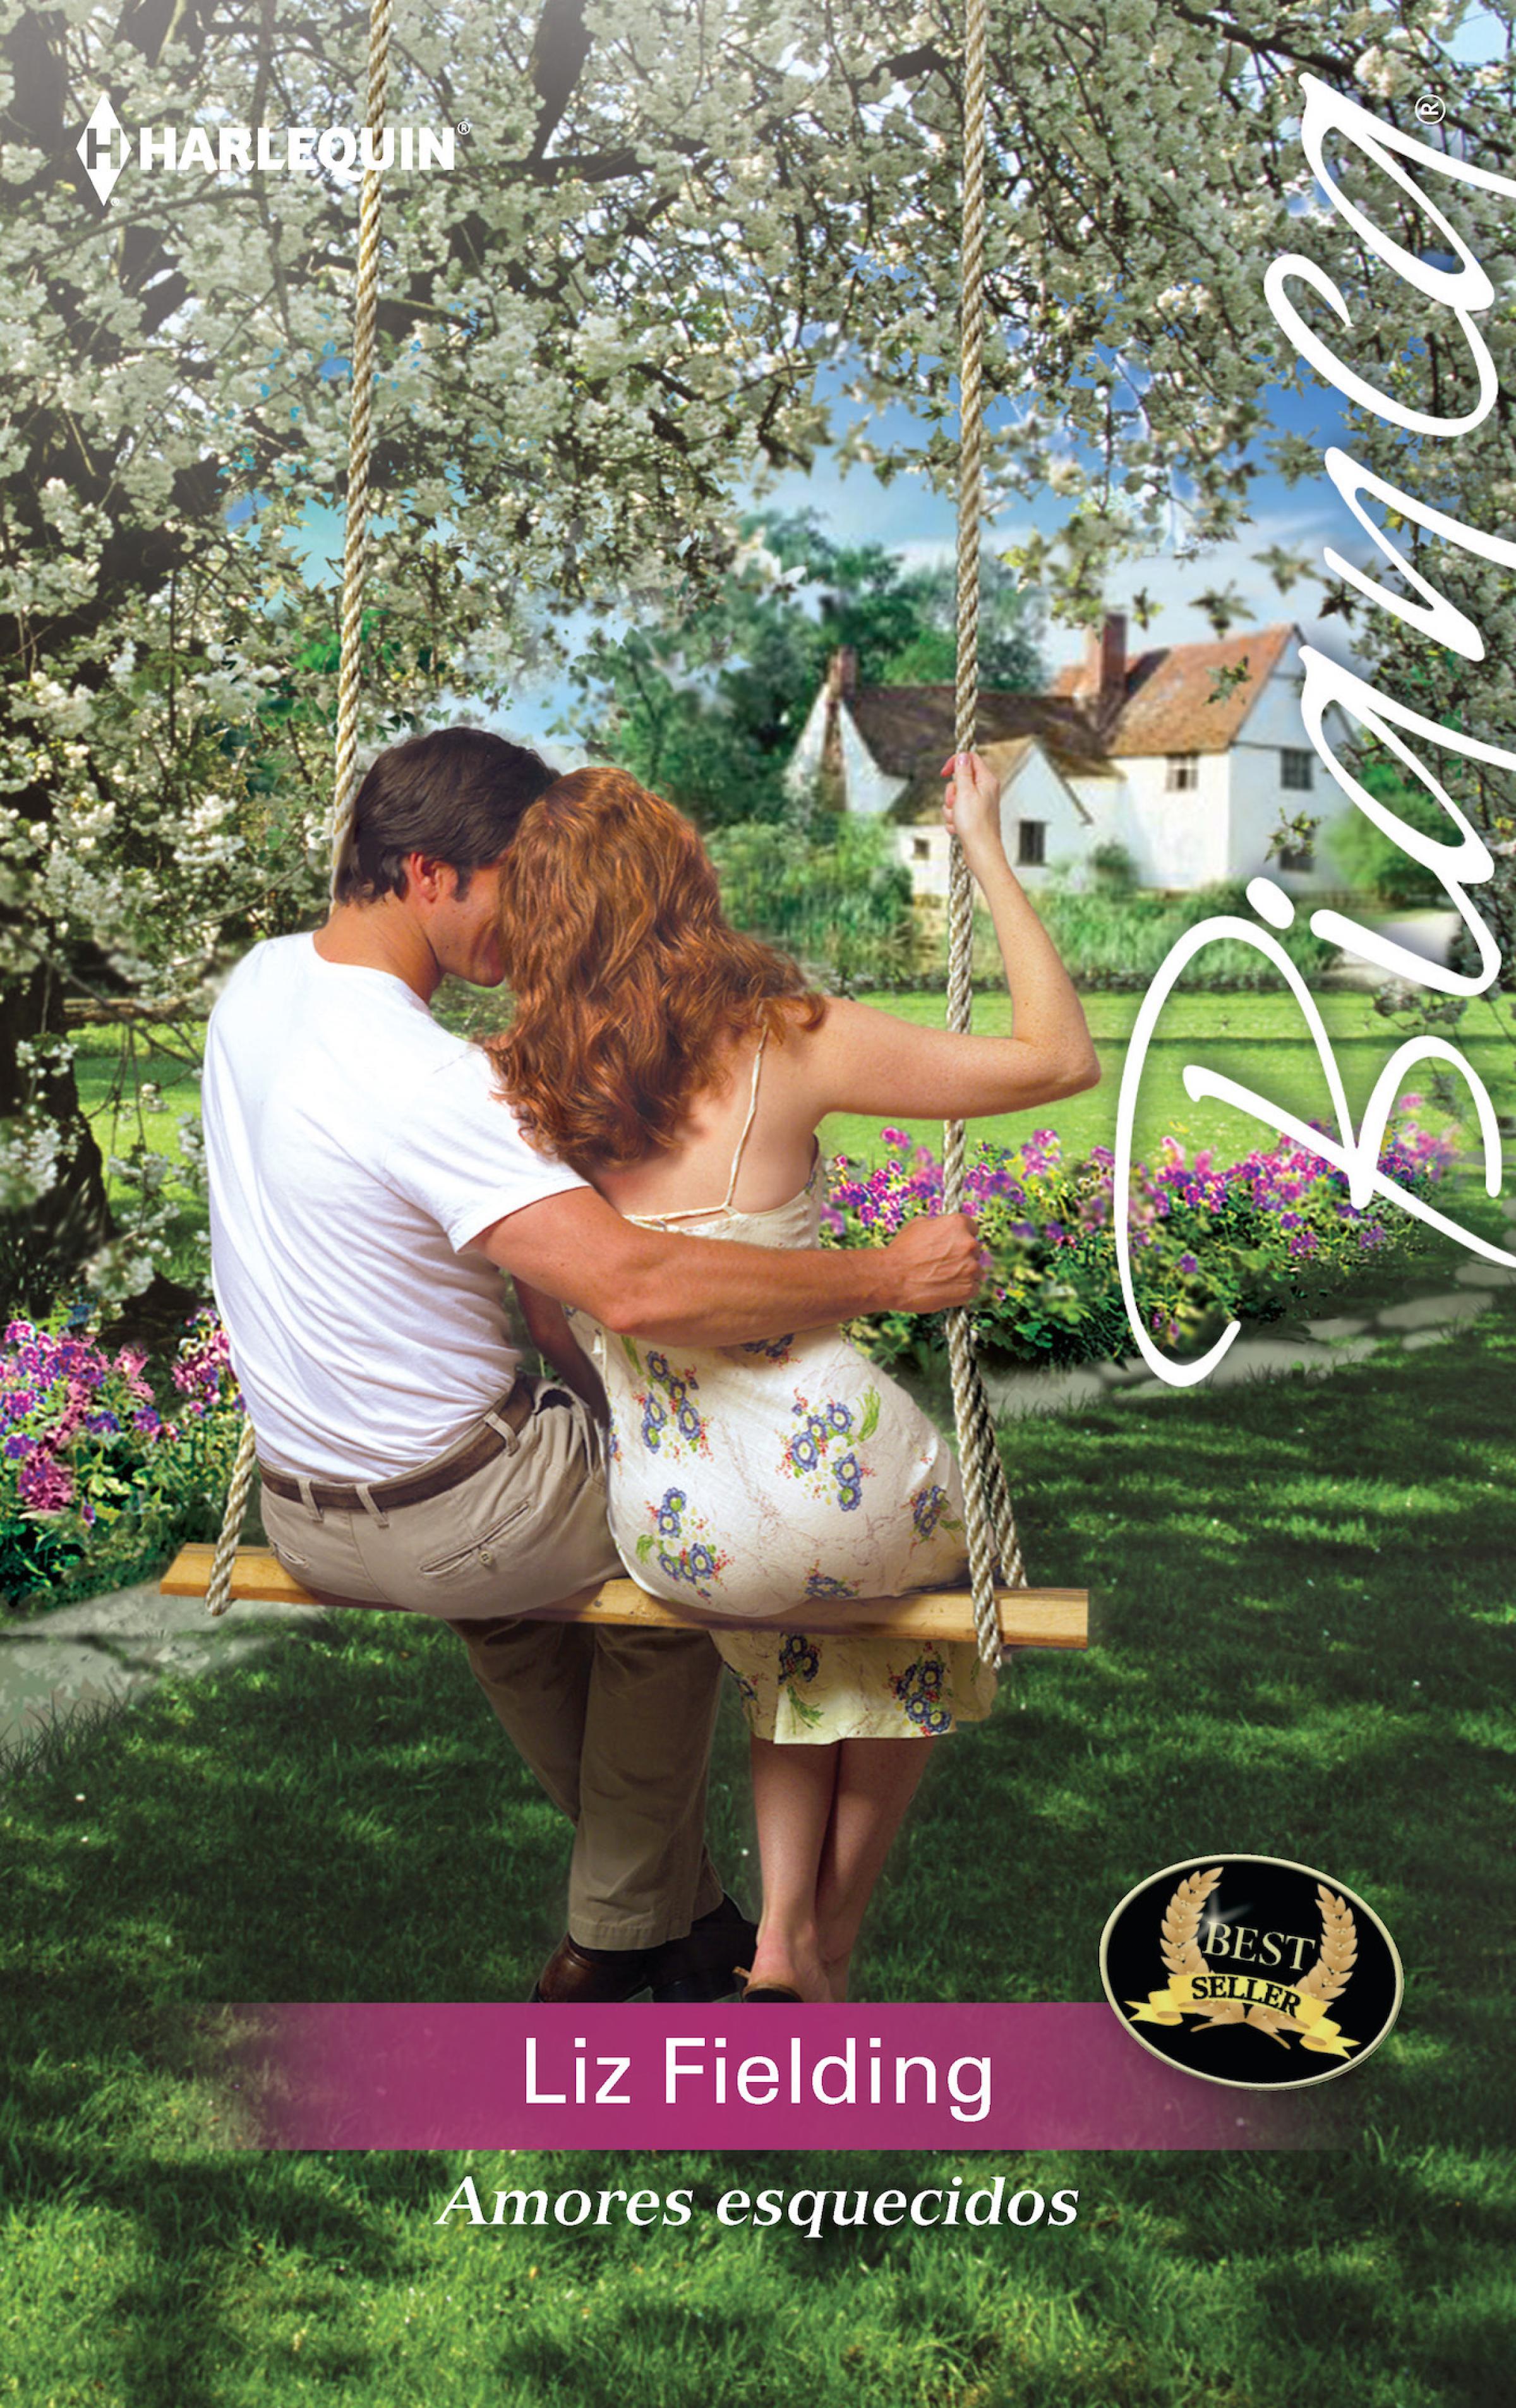 Liz Fielding Amores esquecidos liz fielding his runaway bride